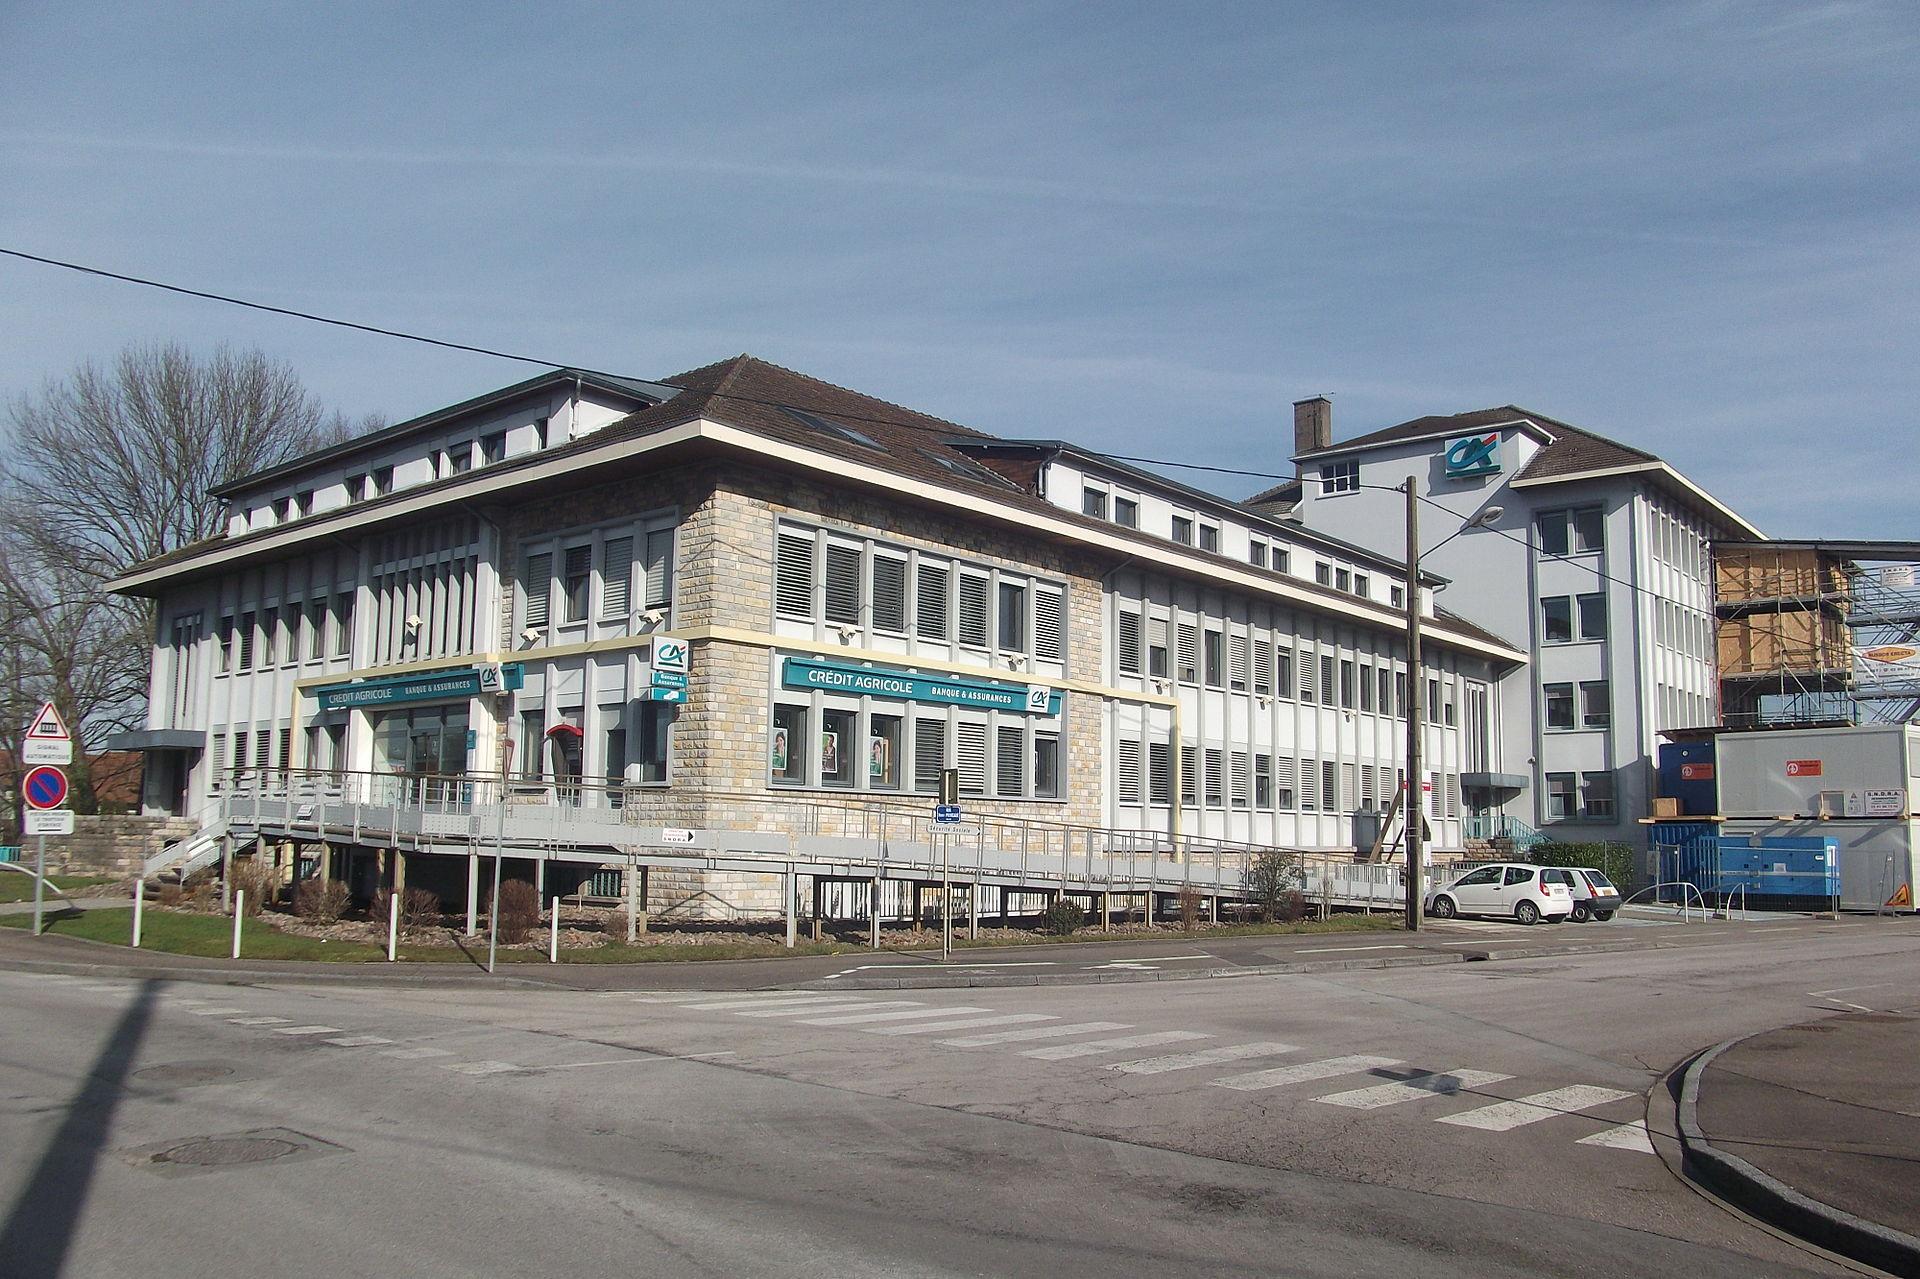 Cr Ef Bf Bddit Agricole Centre France Brive Thiers Ville Brive La Gaillarde